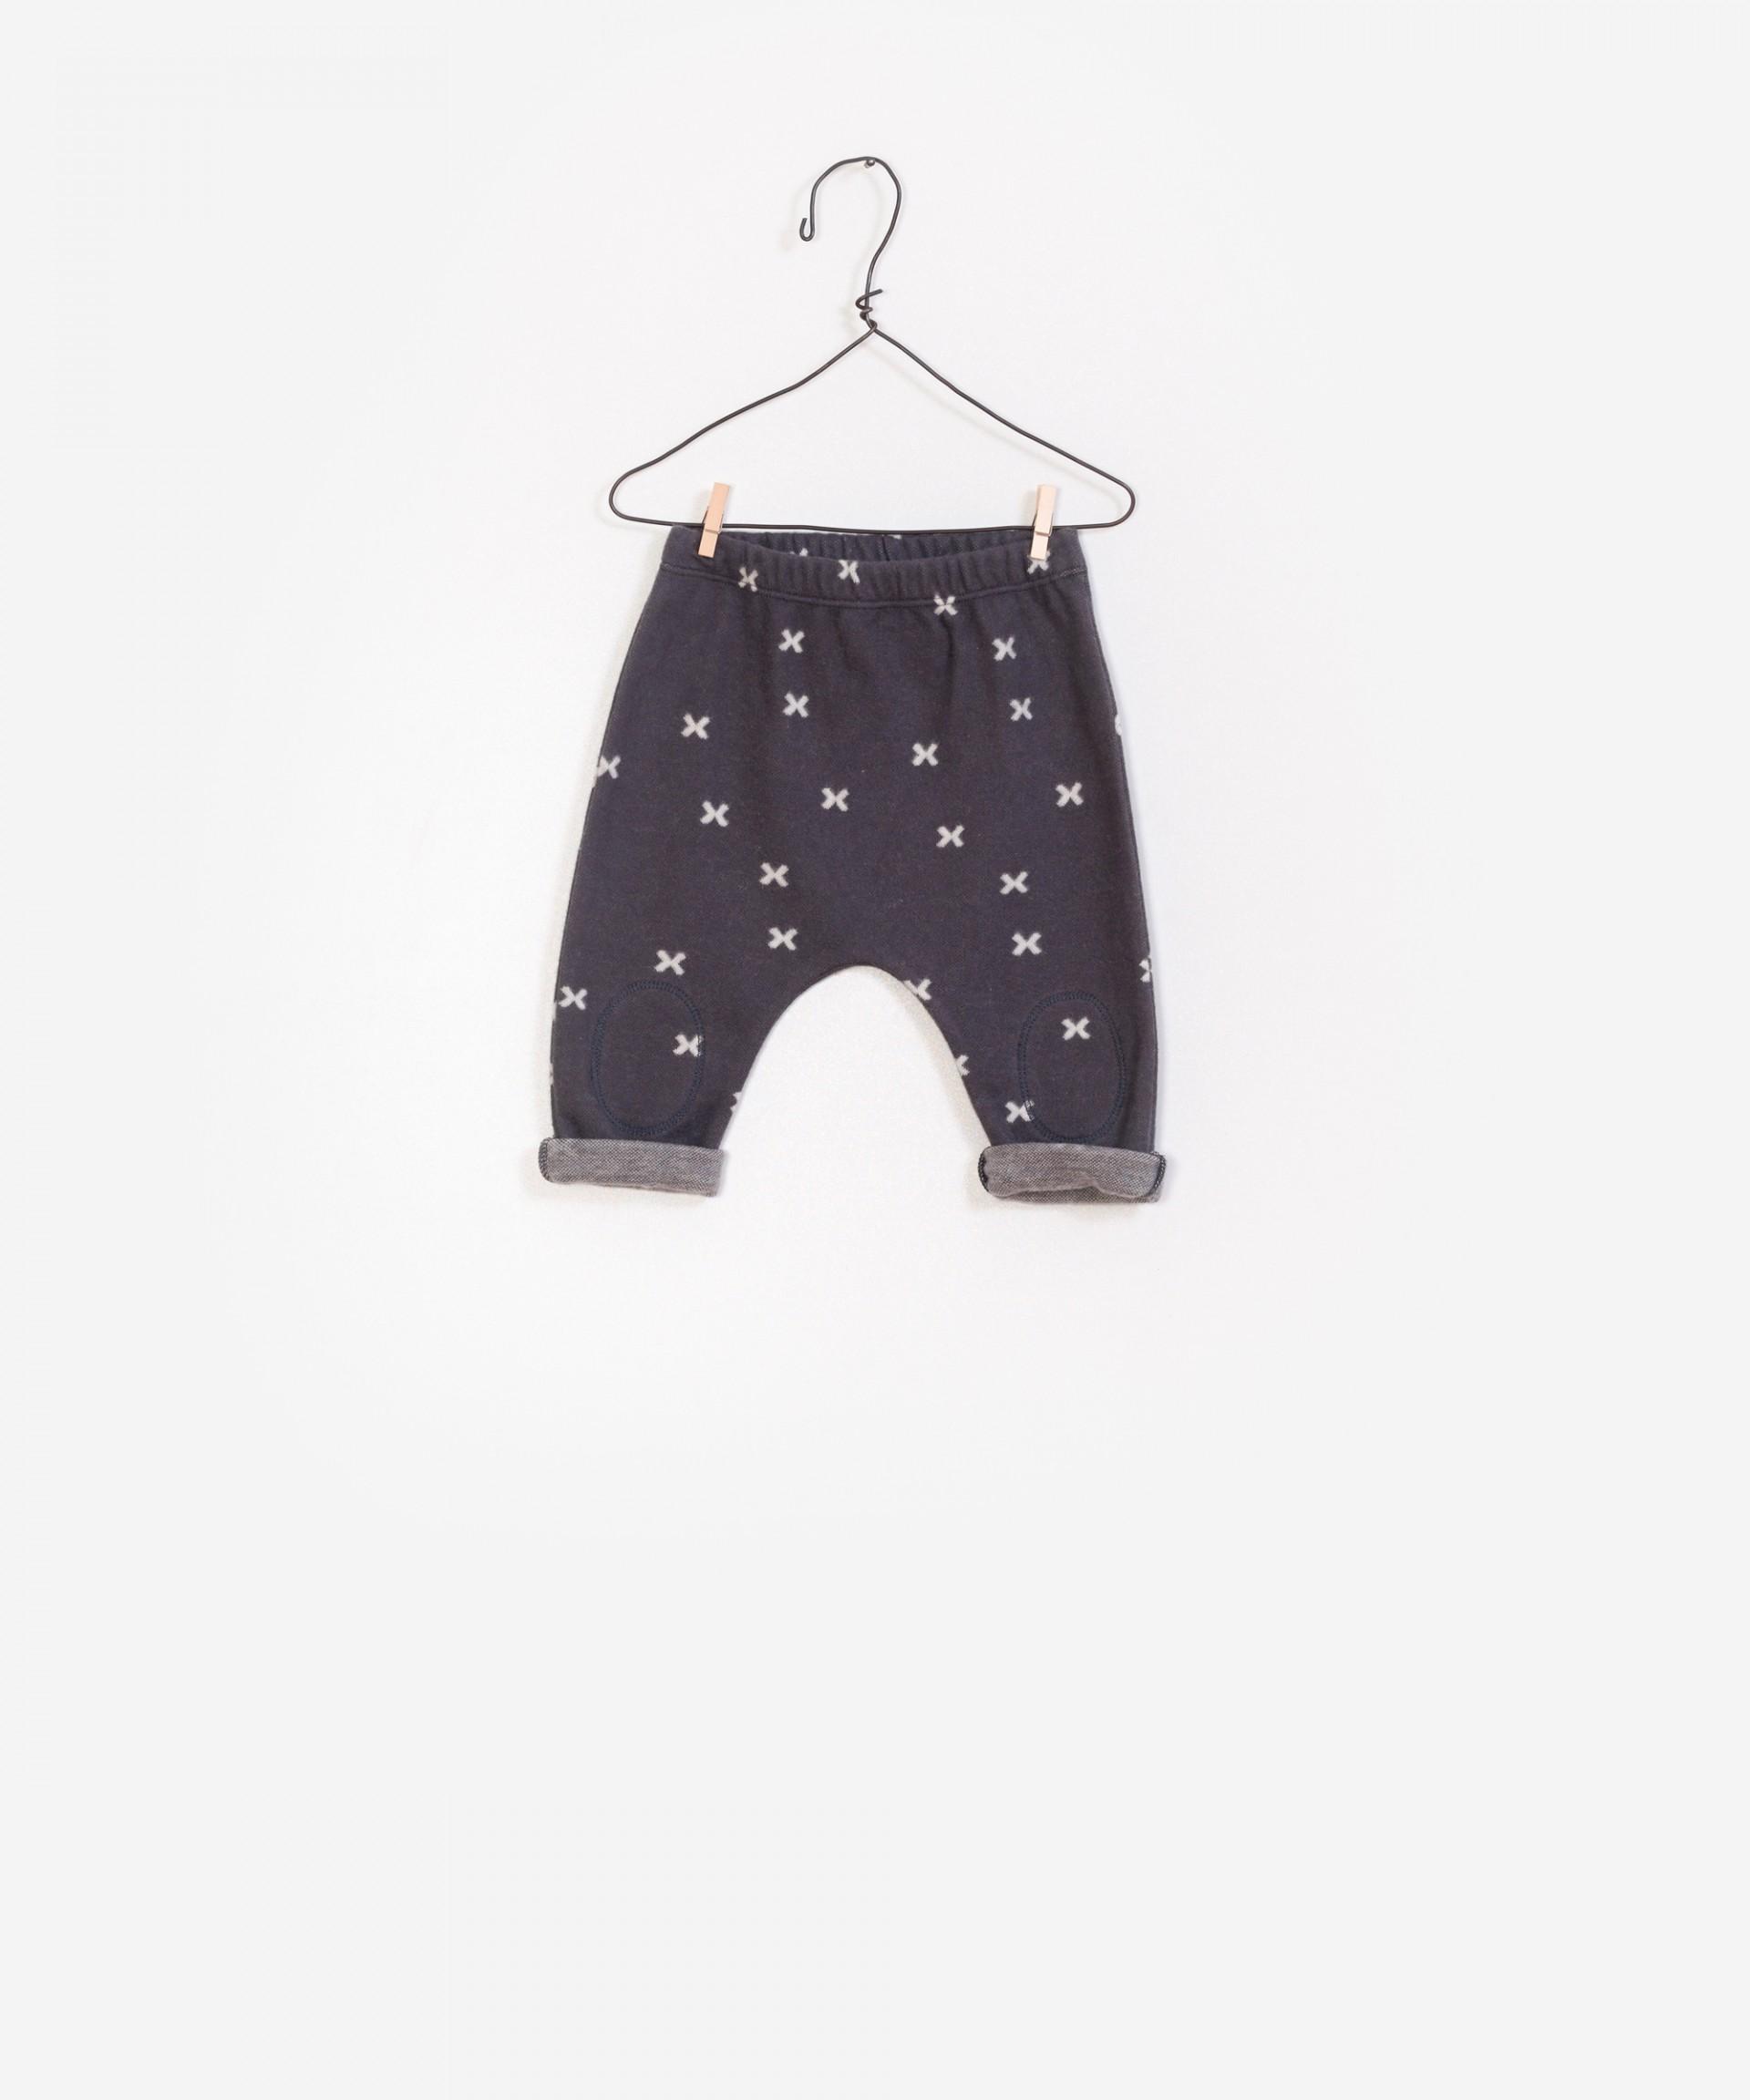 Pants 100% organic cotton with print